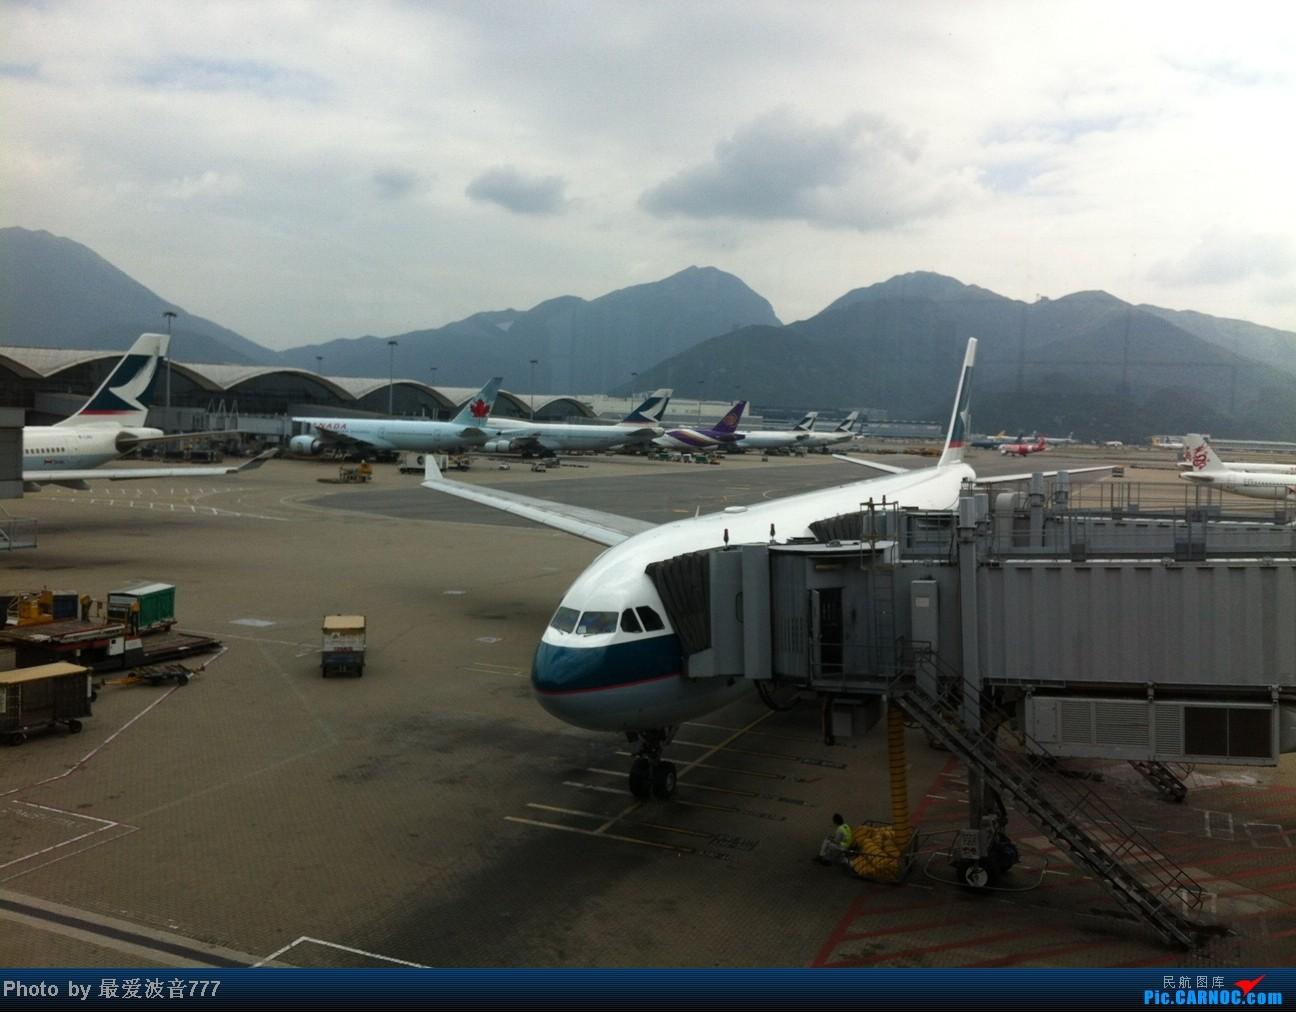 Re:[原创]假期的回国往返之旅 LHR-HKG-CTU-HKG-LHR, CX+CA+KA联合运营 AIRBUS A330-300 B-HLO 中国香港赤鱲角国际机场